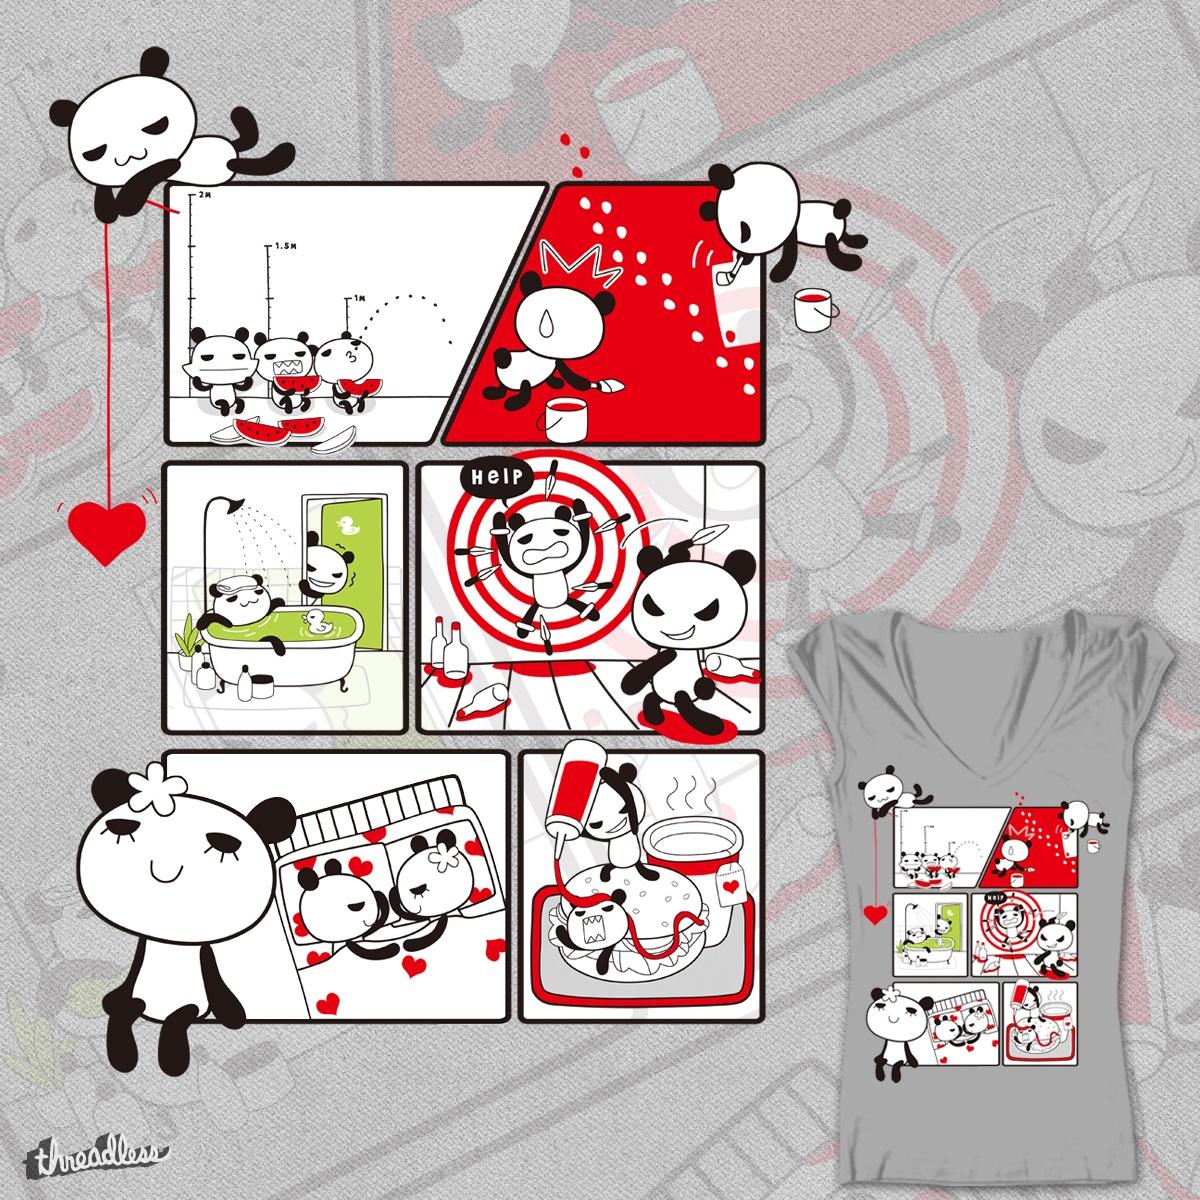 Panda daily... by YUURAI on Threadless